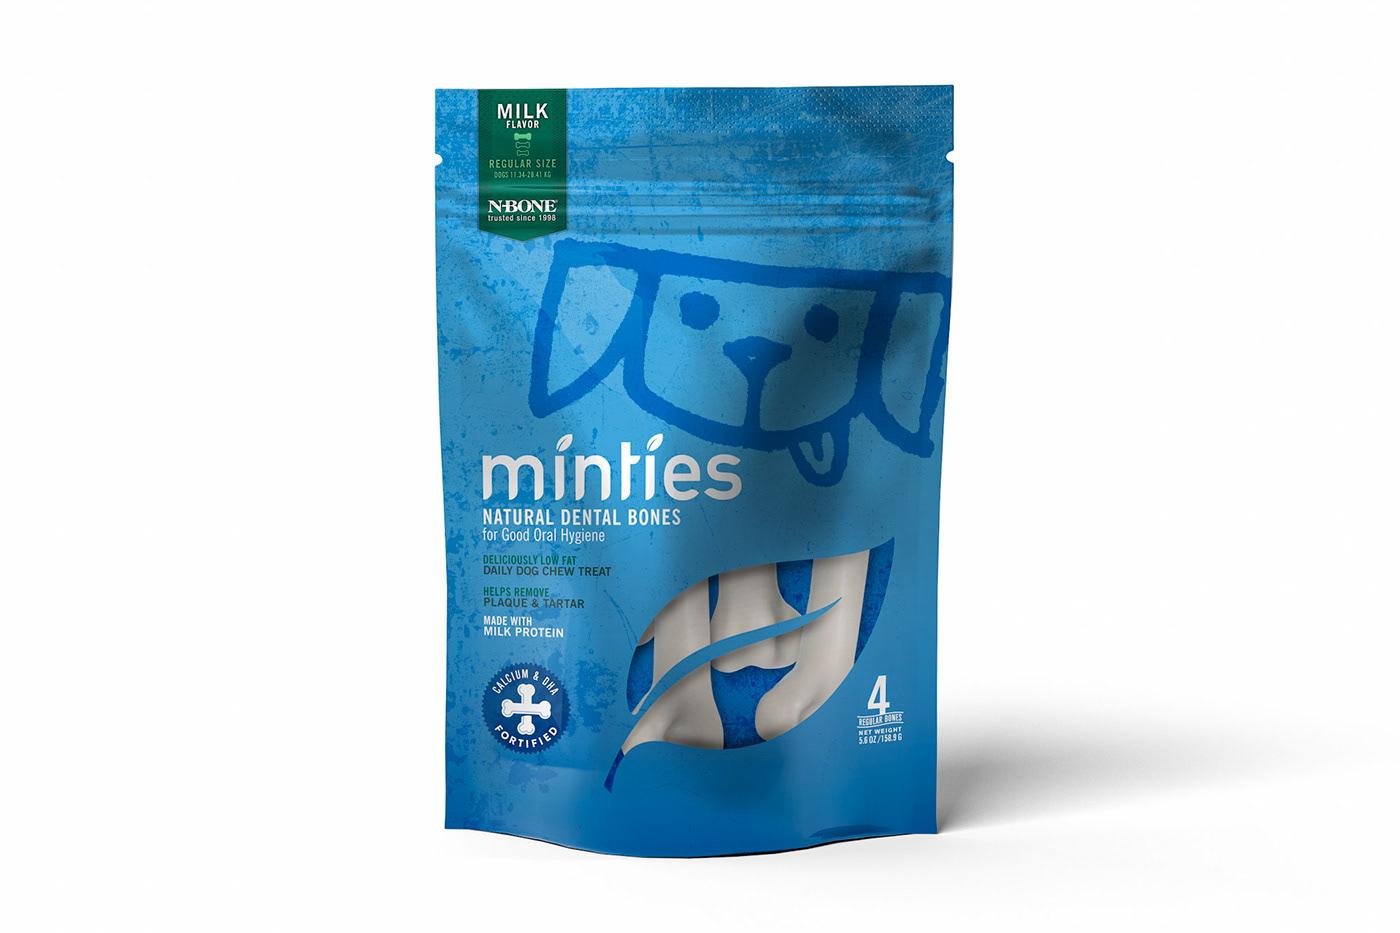 Packaging branding  graphic design  ILLUSTRATION  type design art direction  pet product